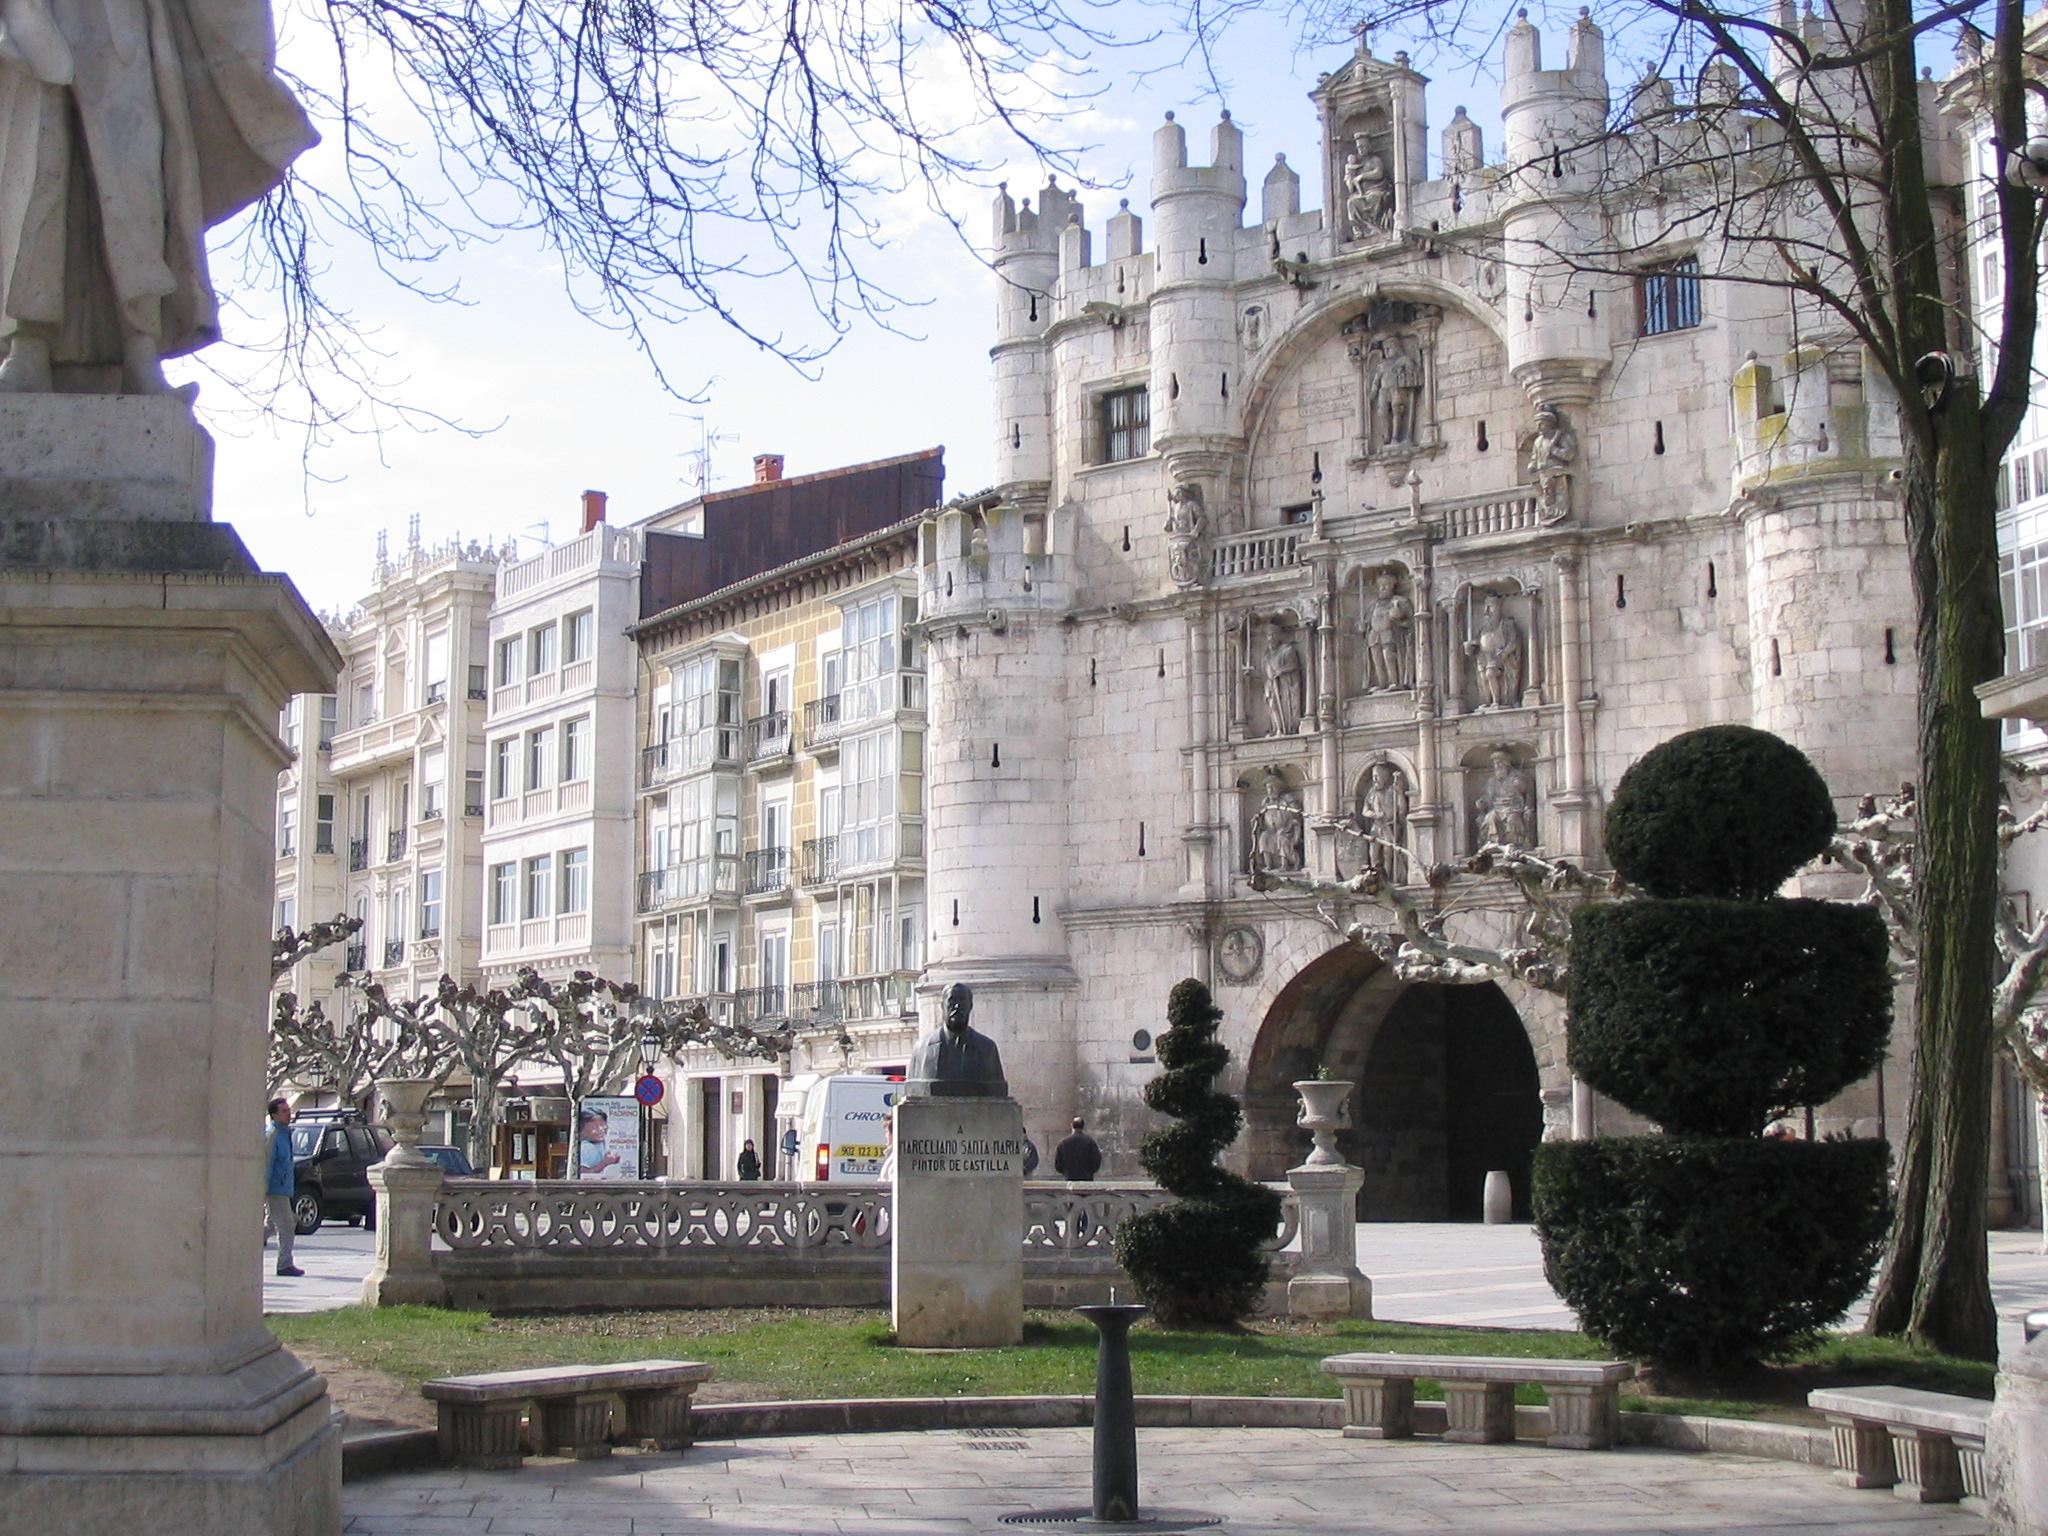 File:Burgos Santa Maria Arc.jpg - Wikimedia Commons